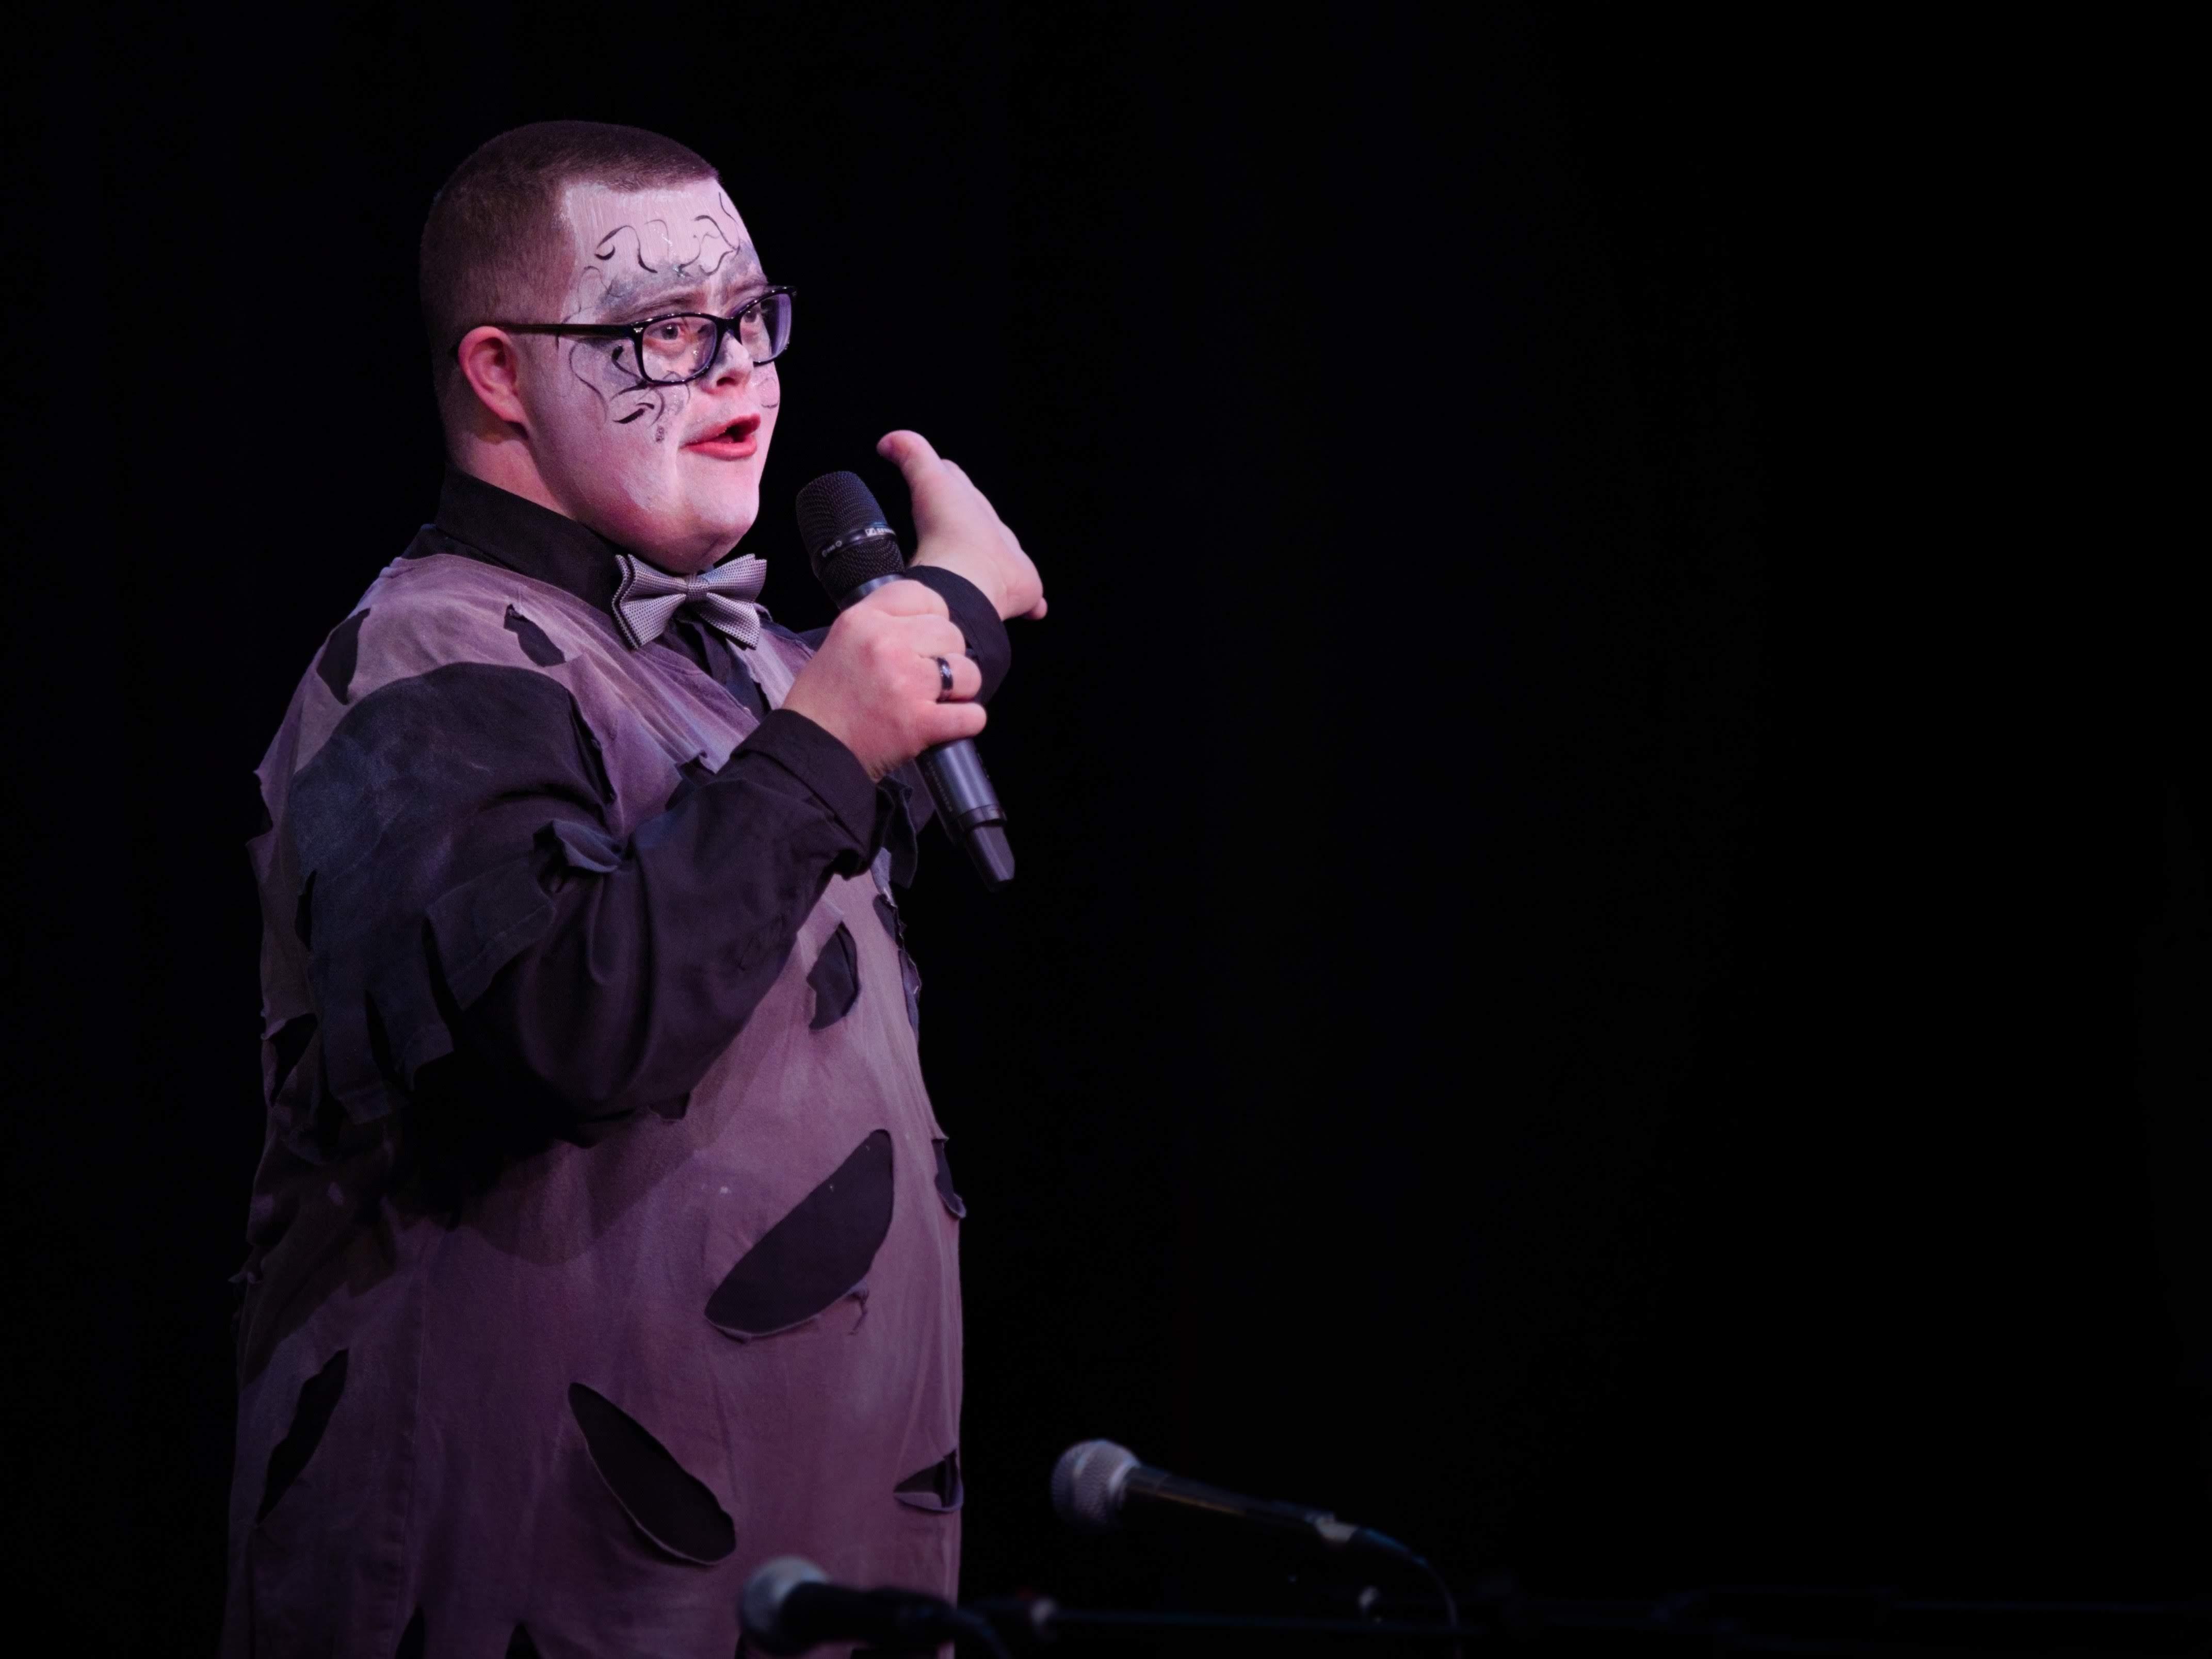 WGE Parasteddfod Matthew Gibbons Performs